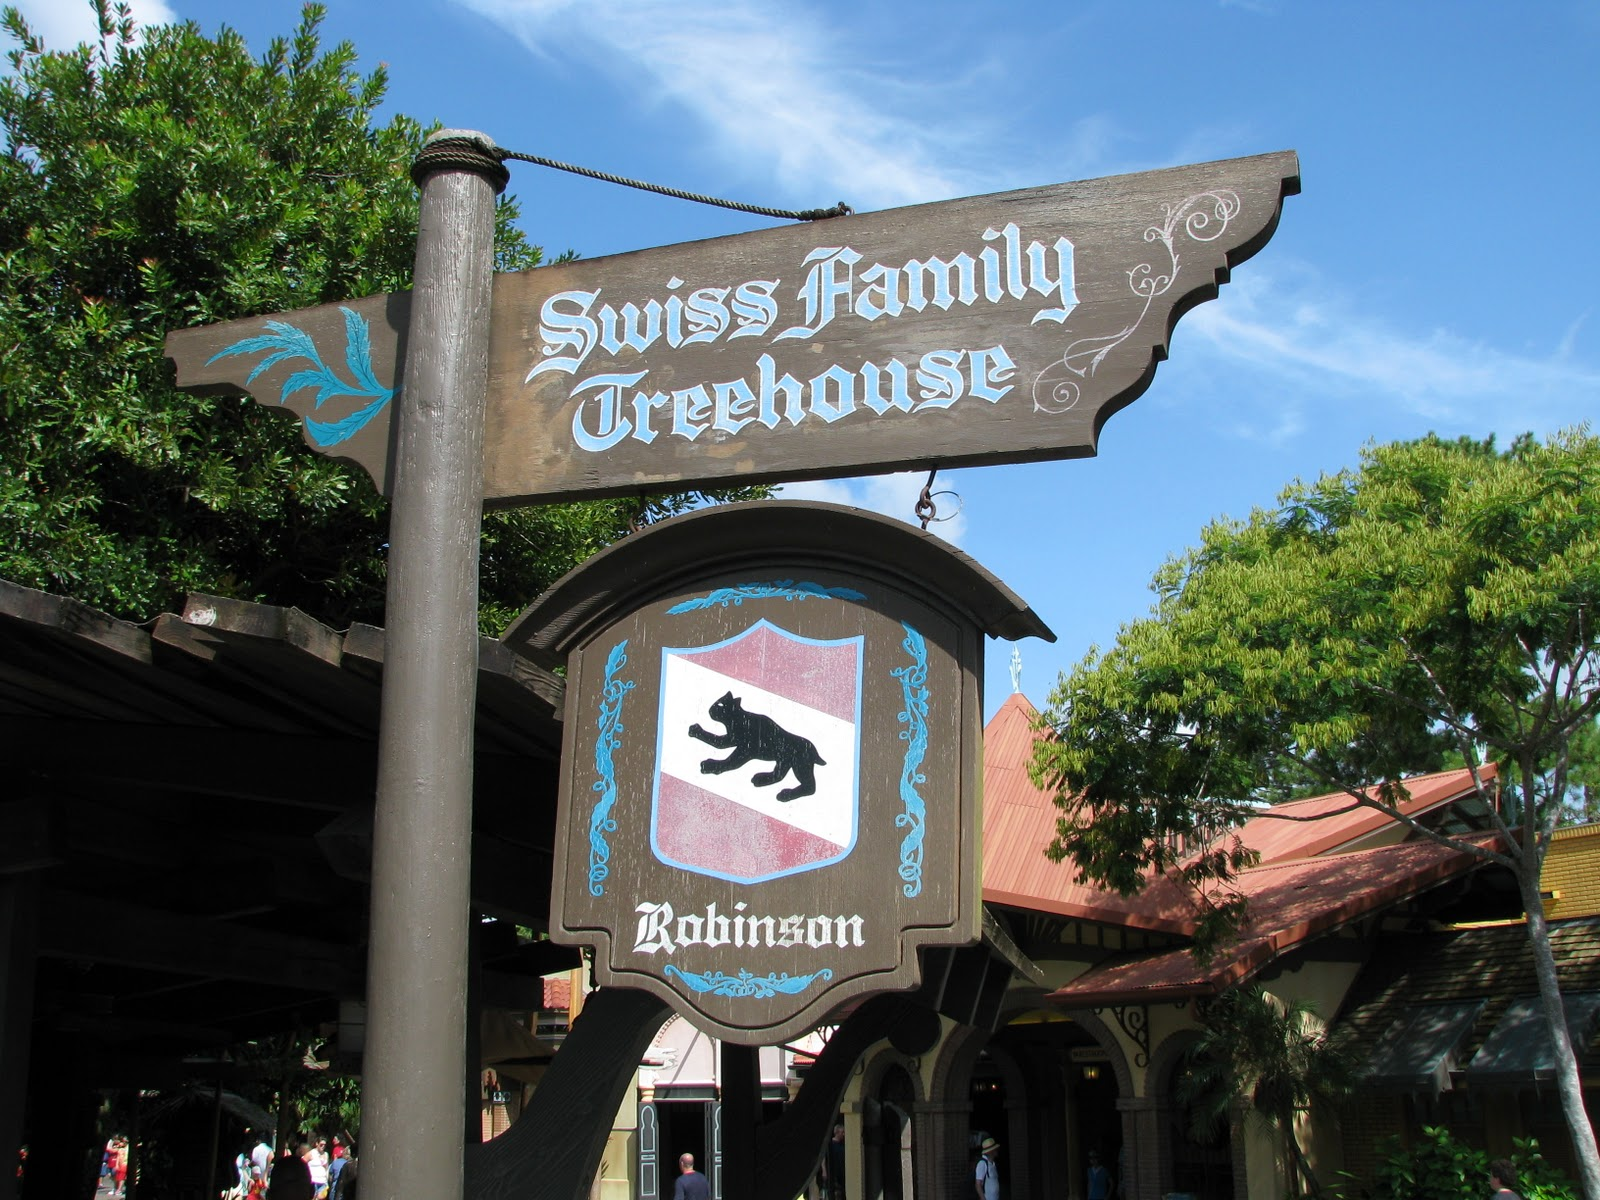 Exploring The Swiss Family Robinson Treehouse